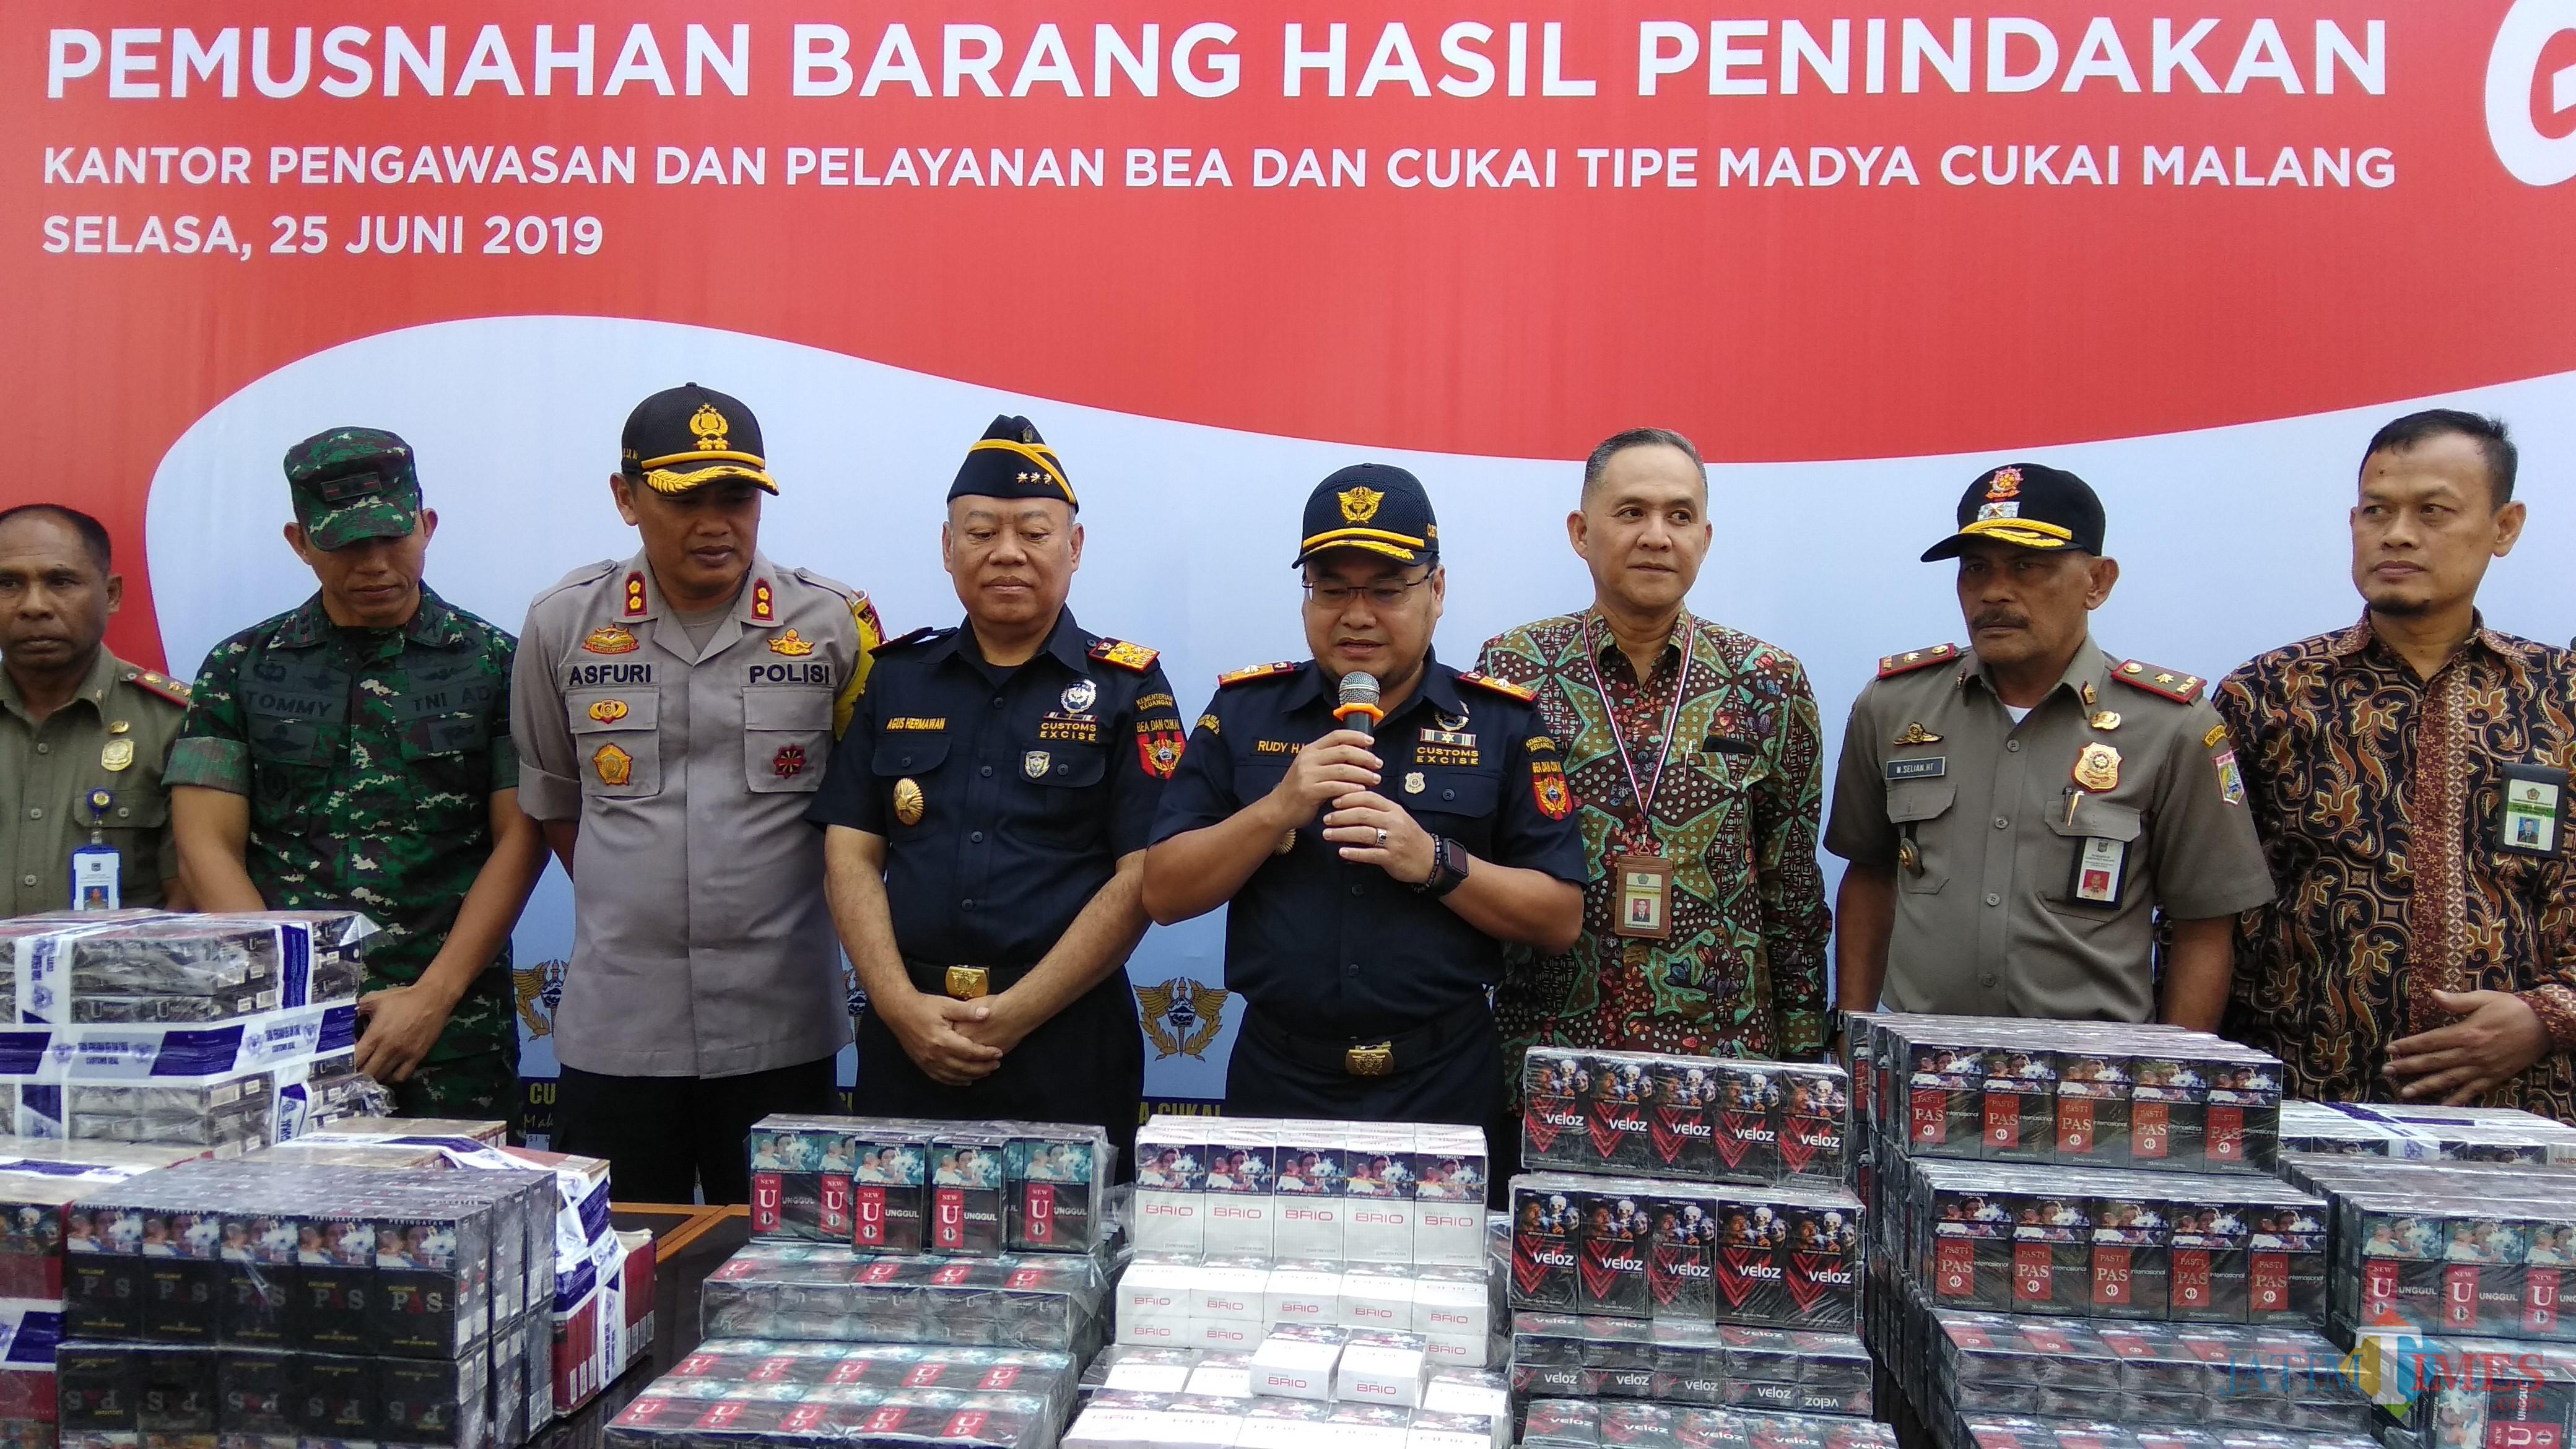 Kegiatan pemusnahan barang hasil penindakan Kantor Bea Cukai Malang periode Januari-Mei 2019. (Foto: Nurlayla Ratri/MalangTIMES)